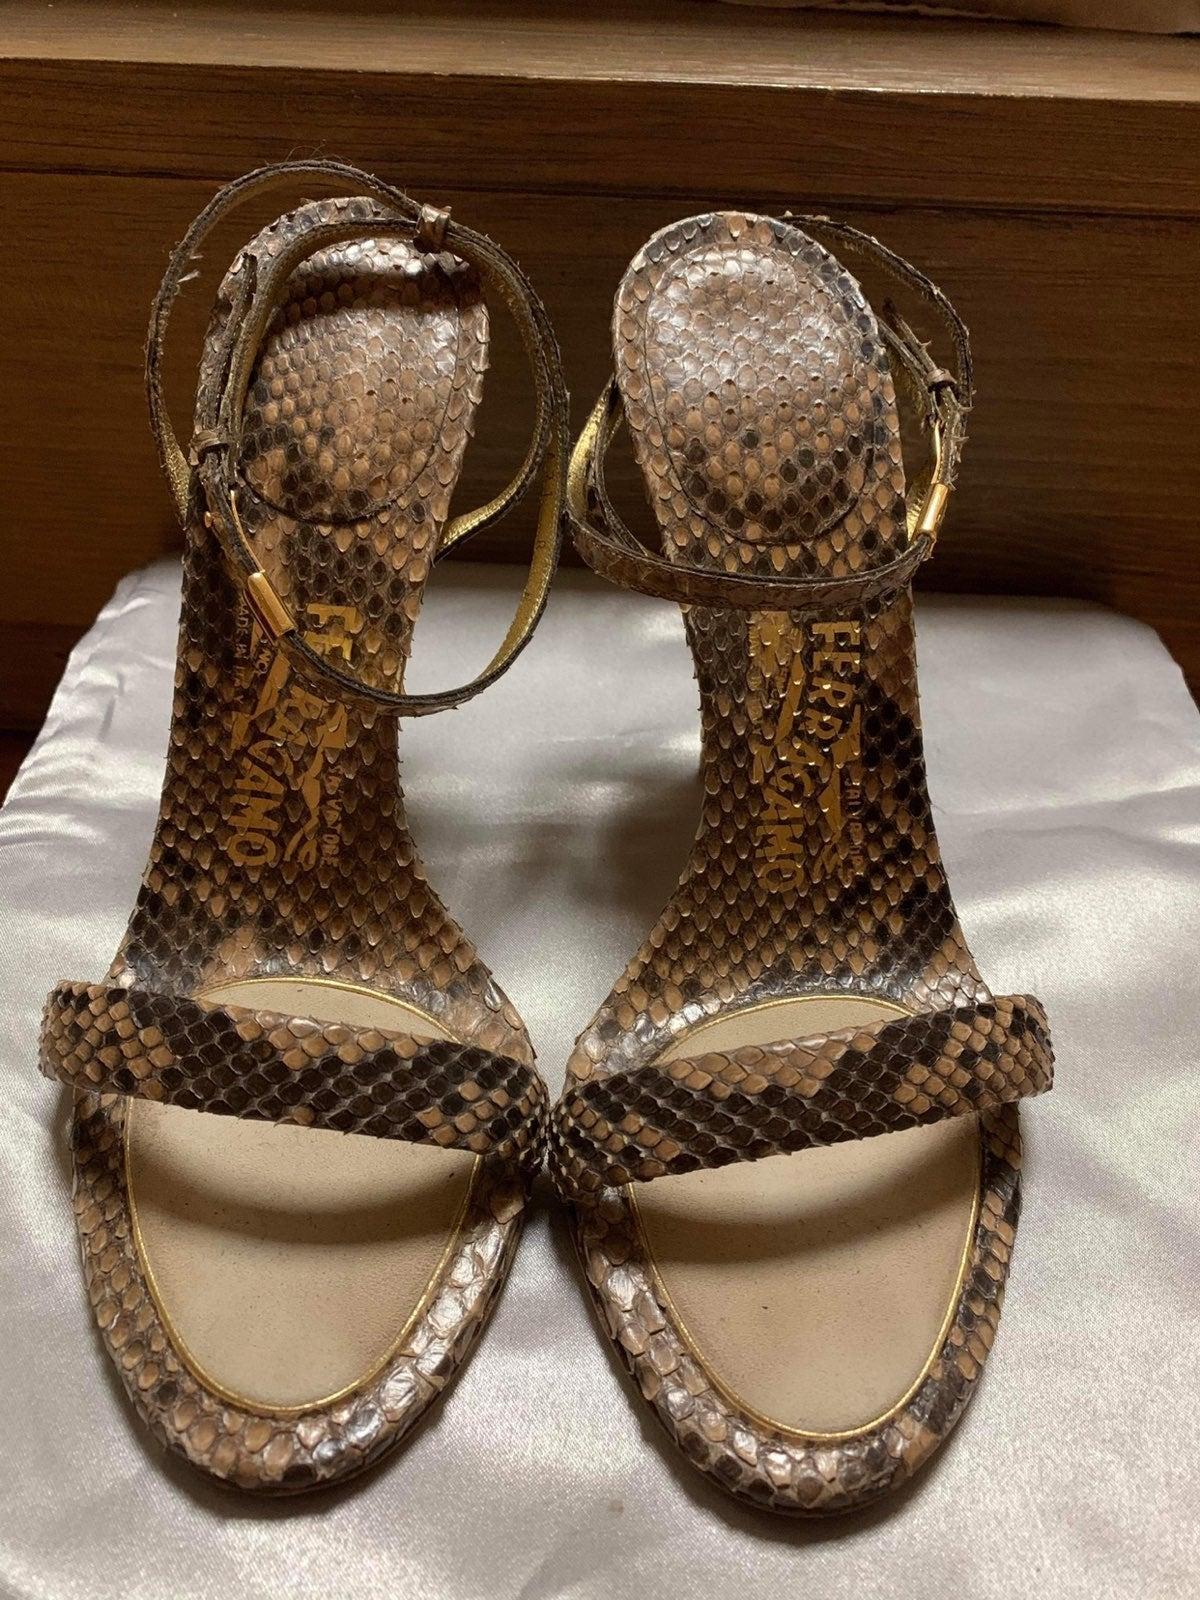 Salvatore Ferragamo Snake-Embossed Shoes